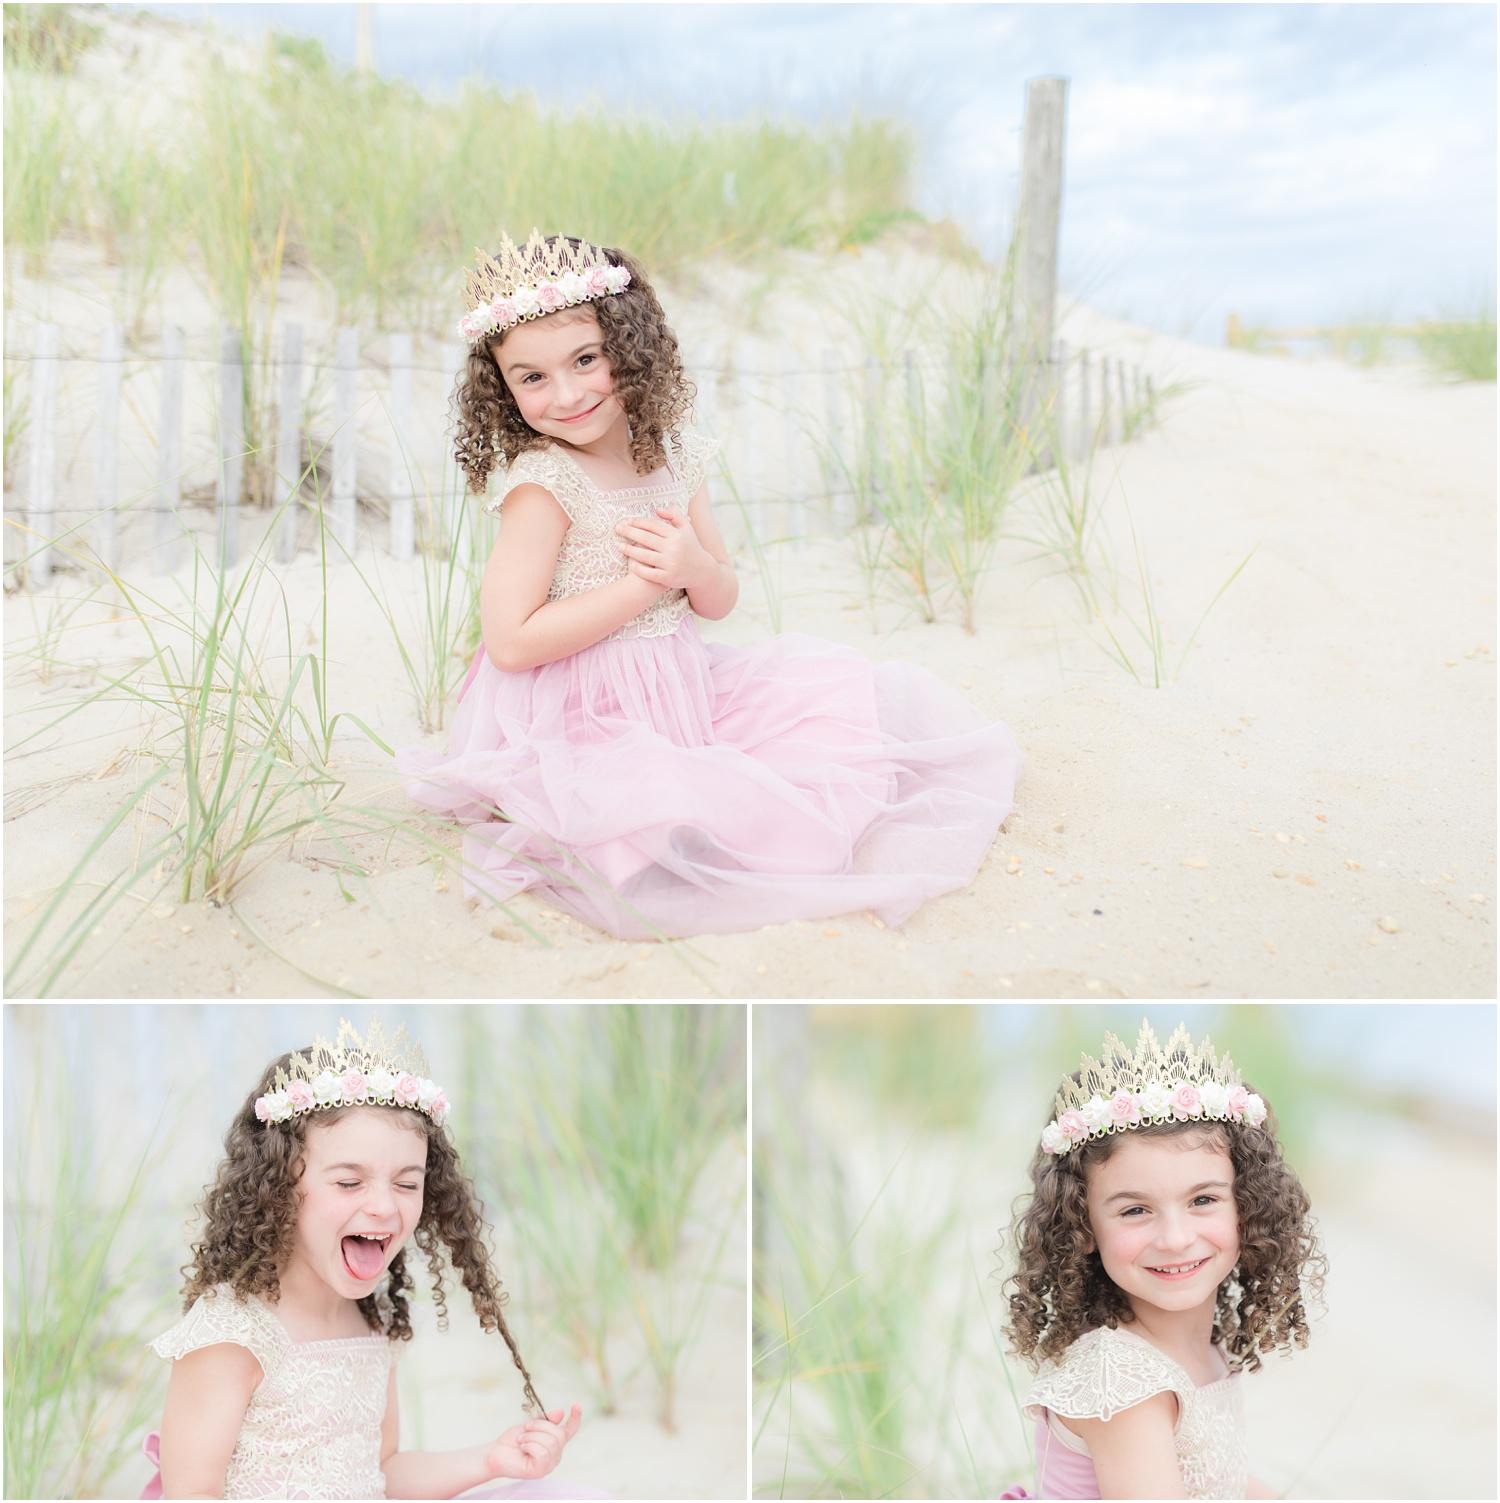 birthday photos on the beach in Lavallette, NJ.